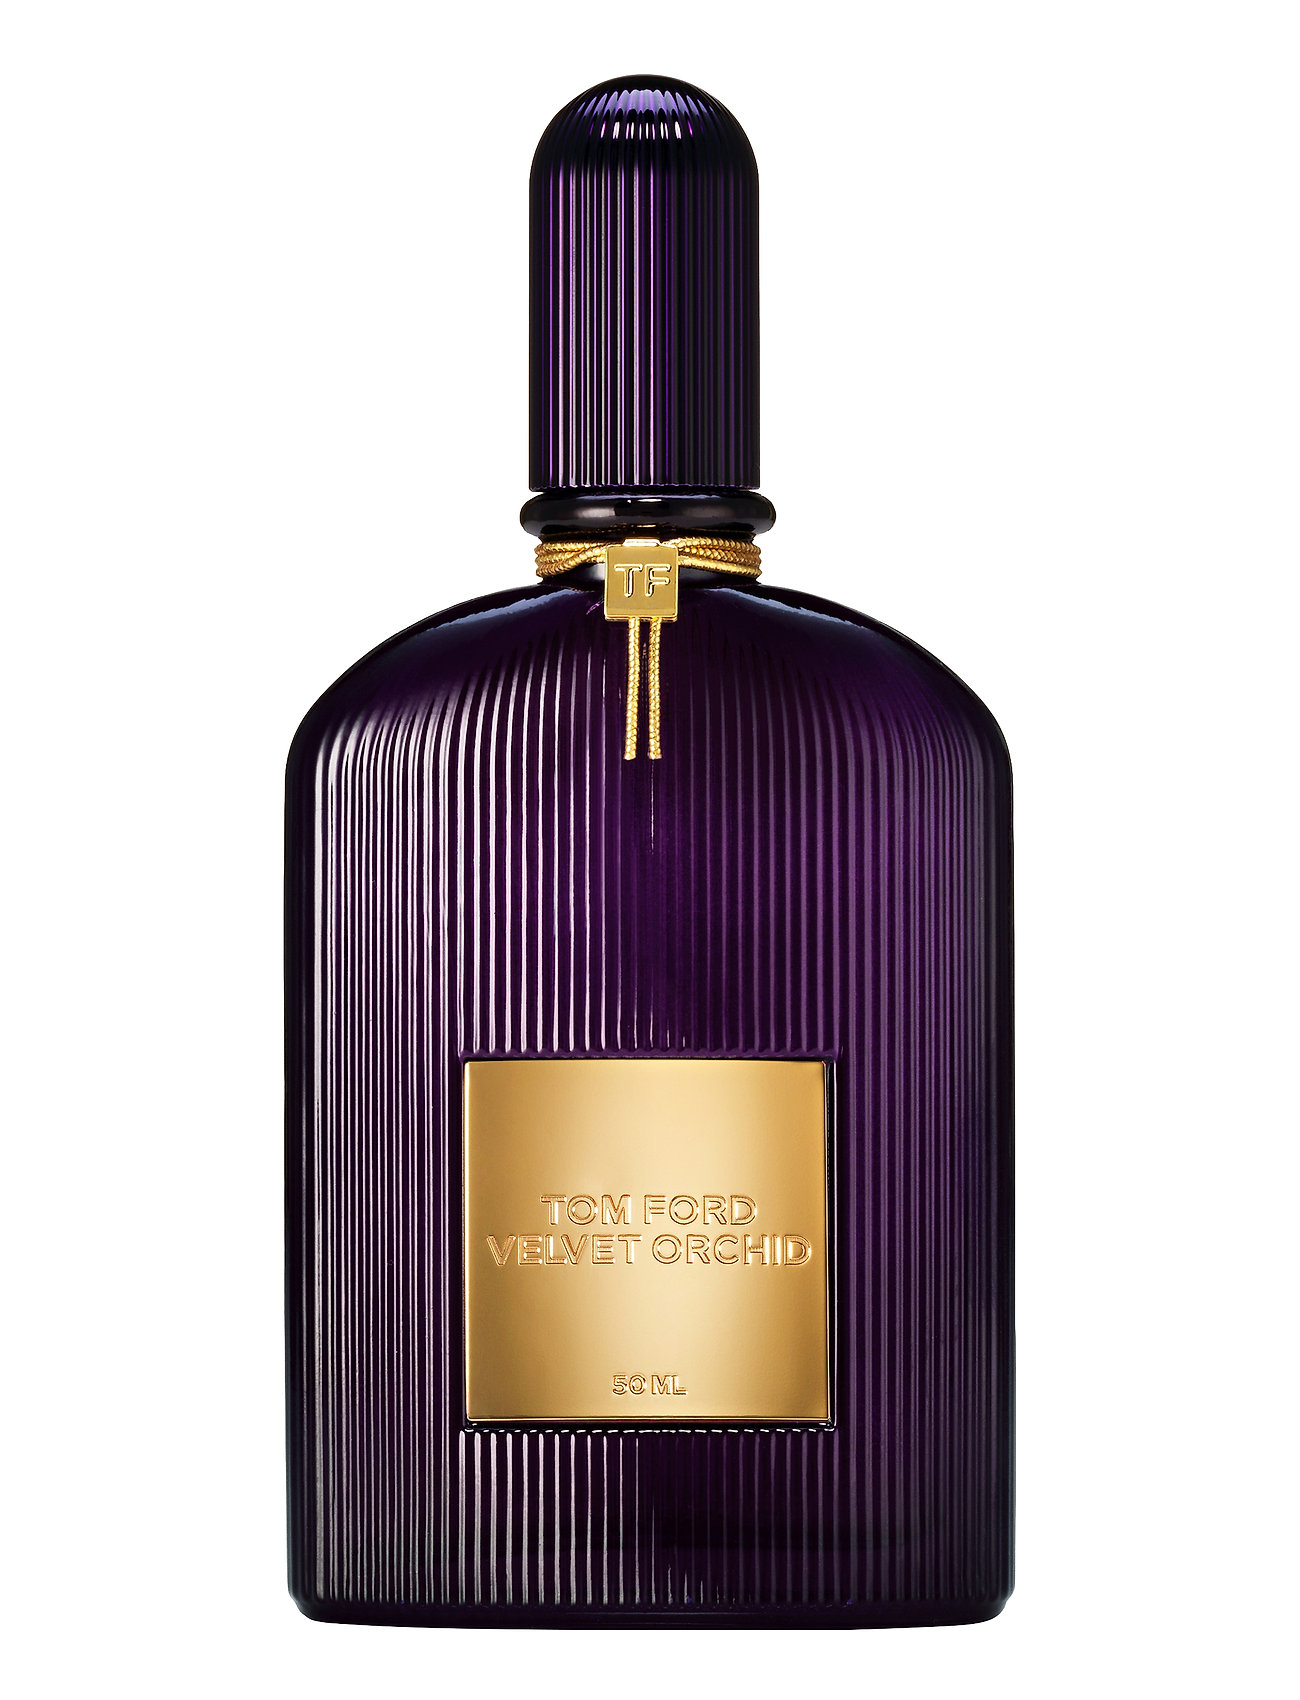 tom ford – Velvet orchid eau de parfum fra boozt.com dk